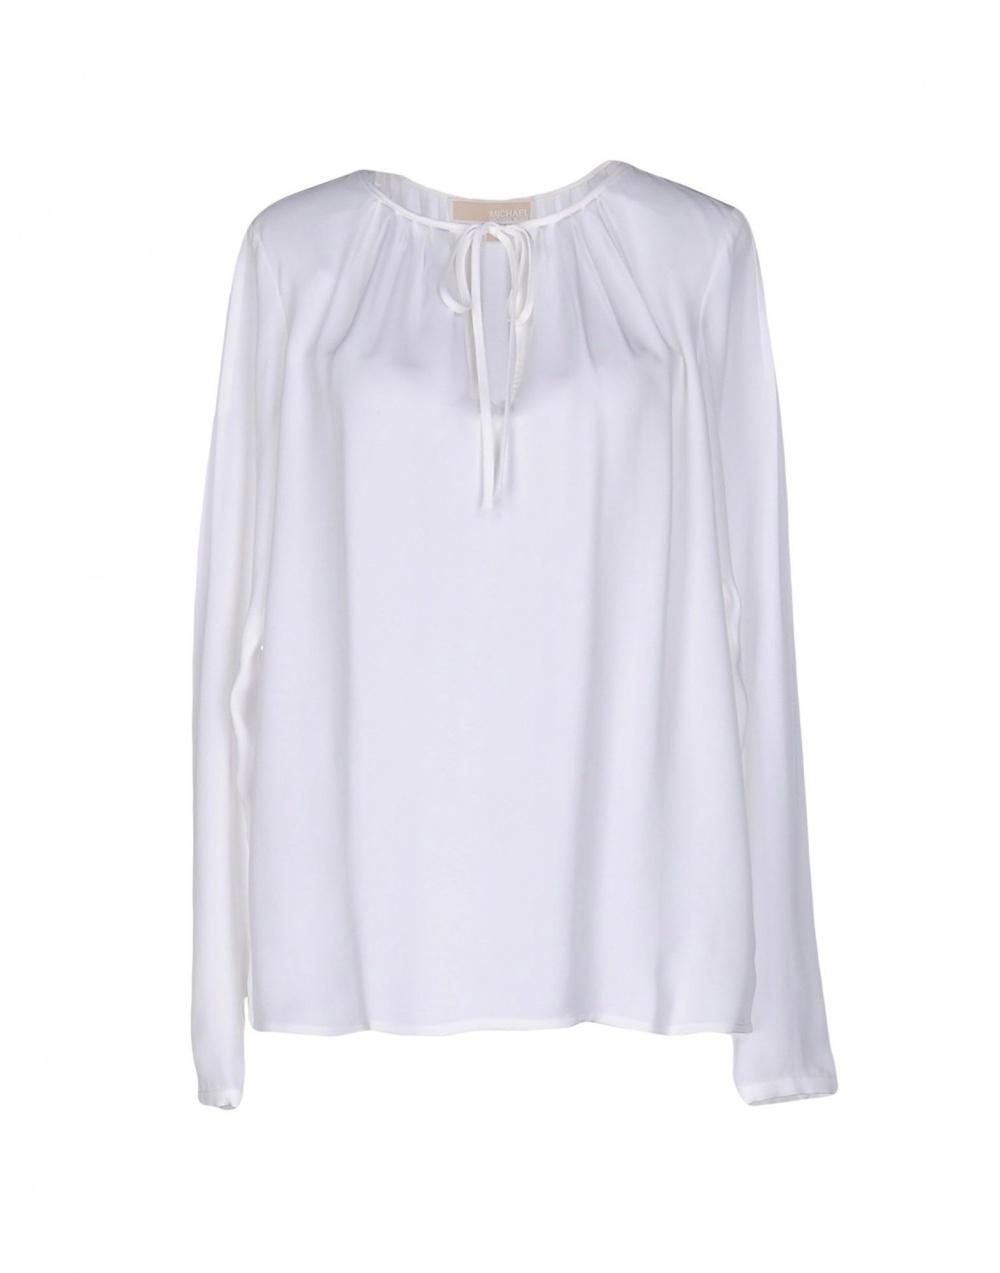 Блуза michael kors, размер 46/48